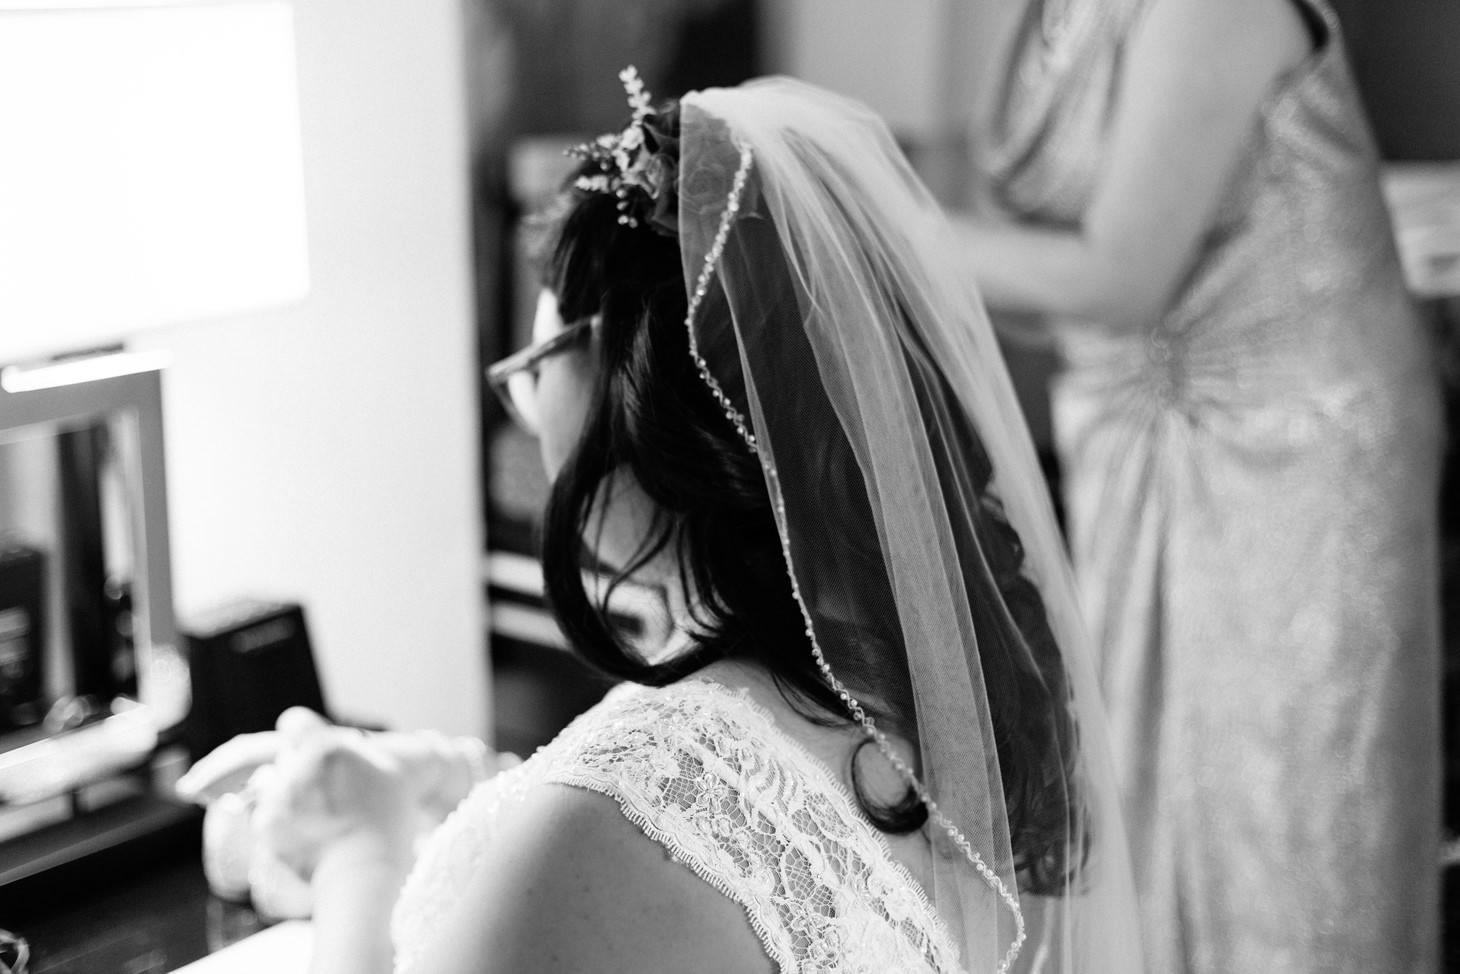 015-nyc-wedding-portrait-photographer-times-square-muse-hotel-winter-wedding-smitten-chickens.jpg